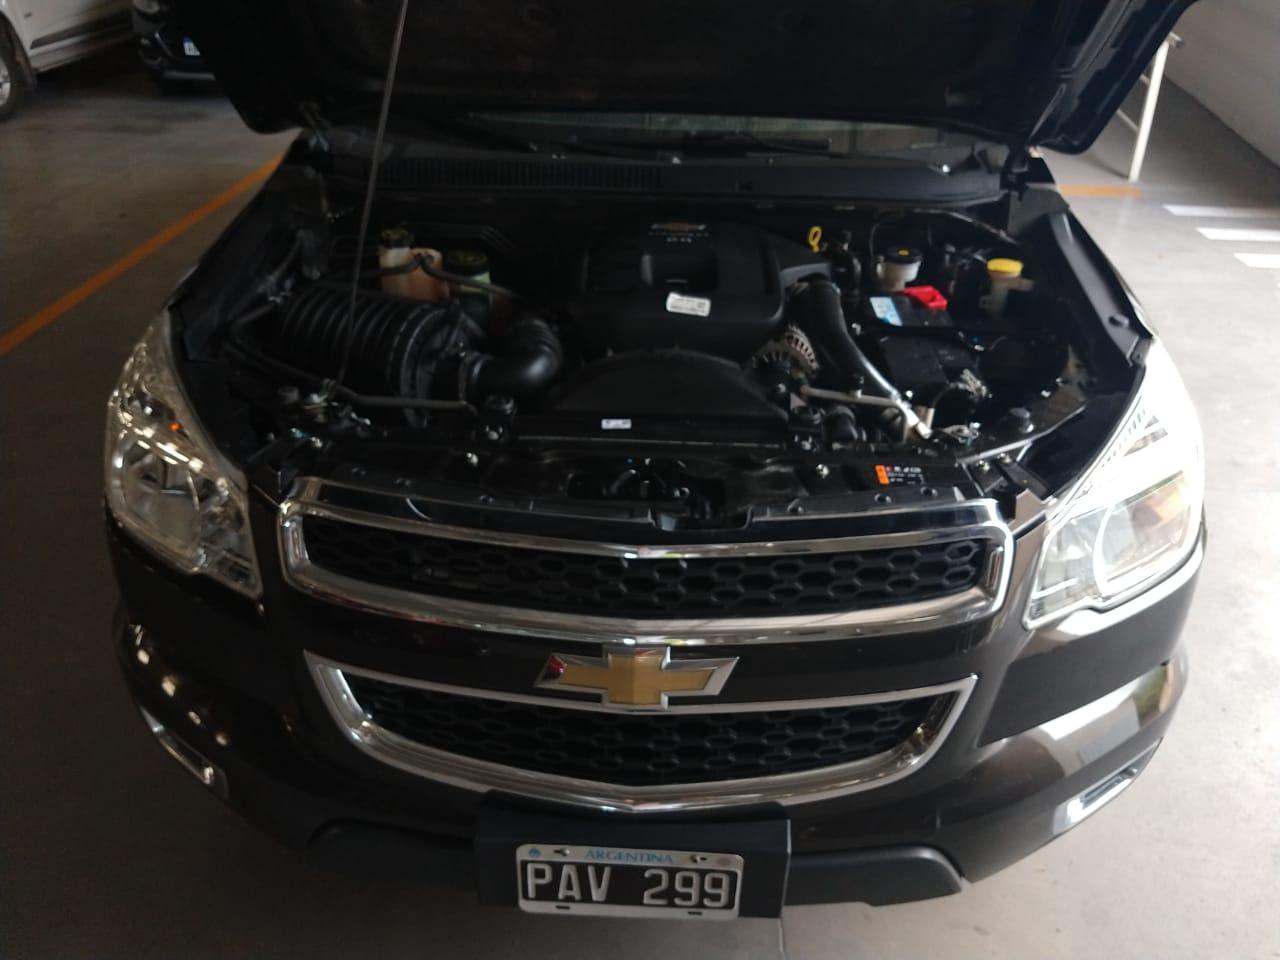 2015 CHEVROLET S10 4X4 LTZ 2,8